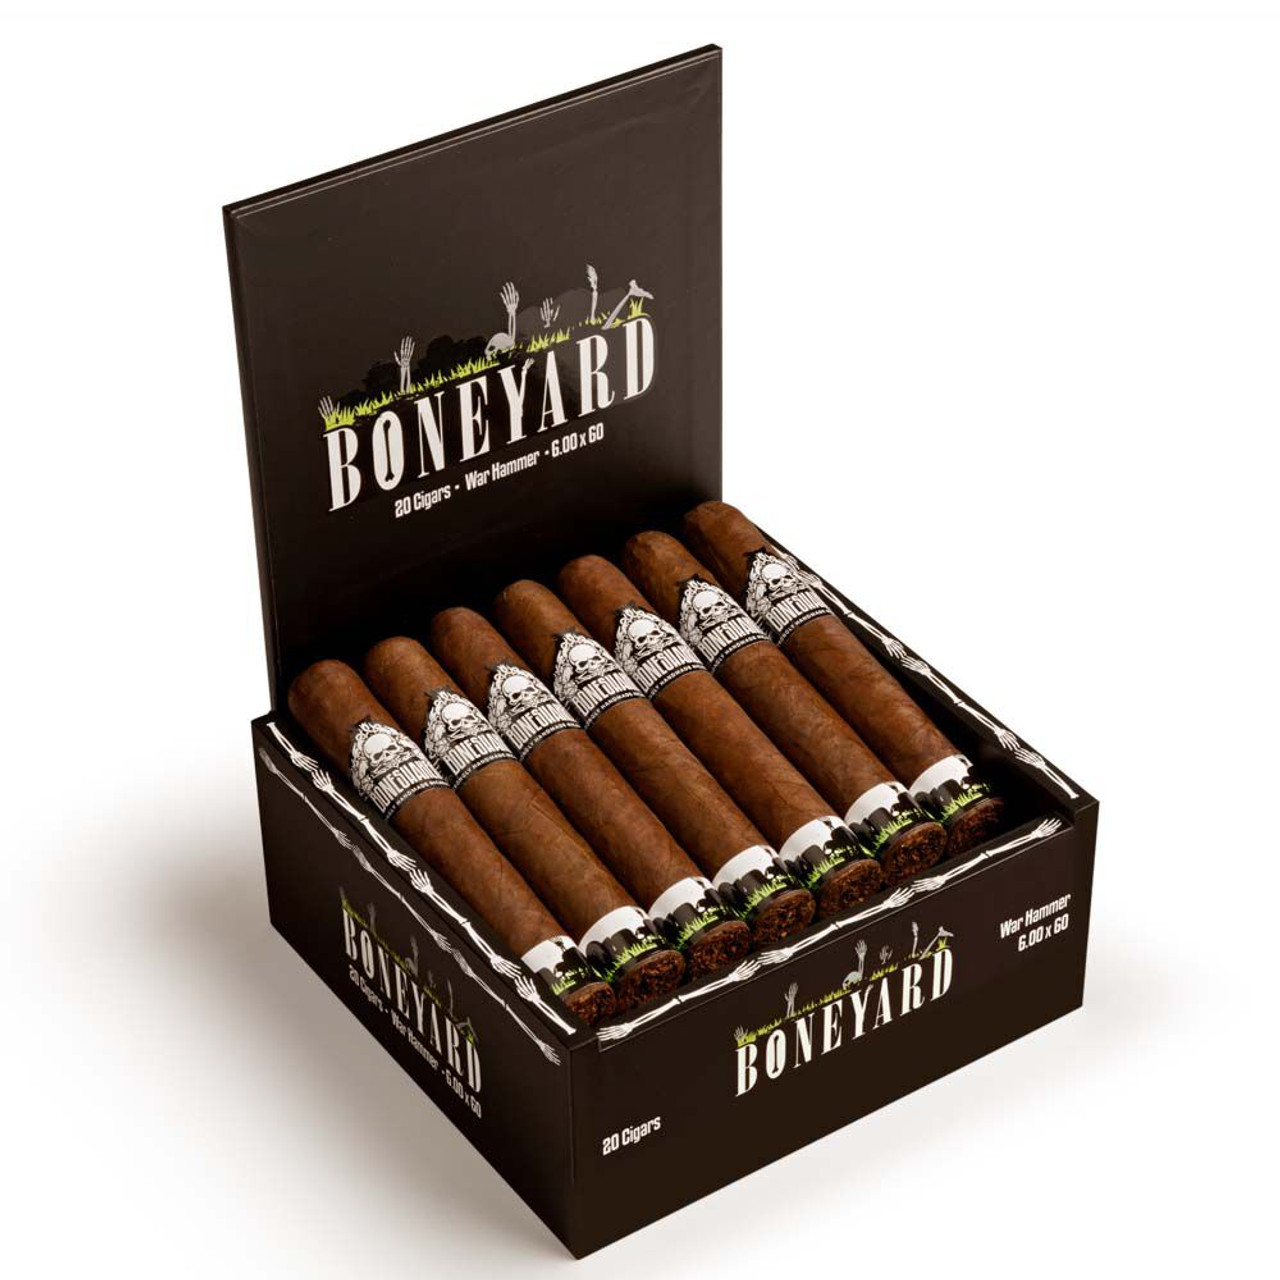 Boneshaker Boneyard Mace Cigars - 5.0 x 52 (Box of 20)